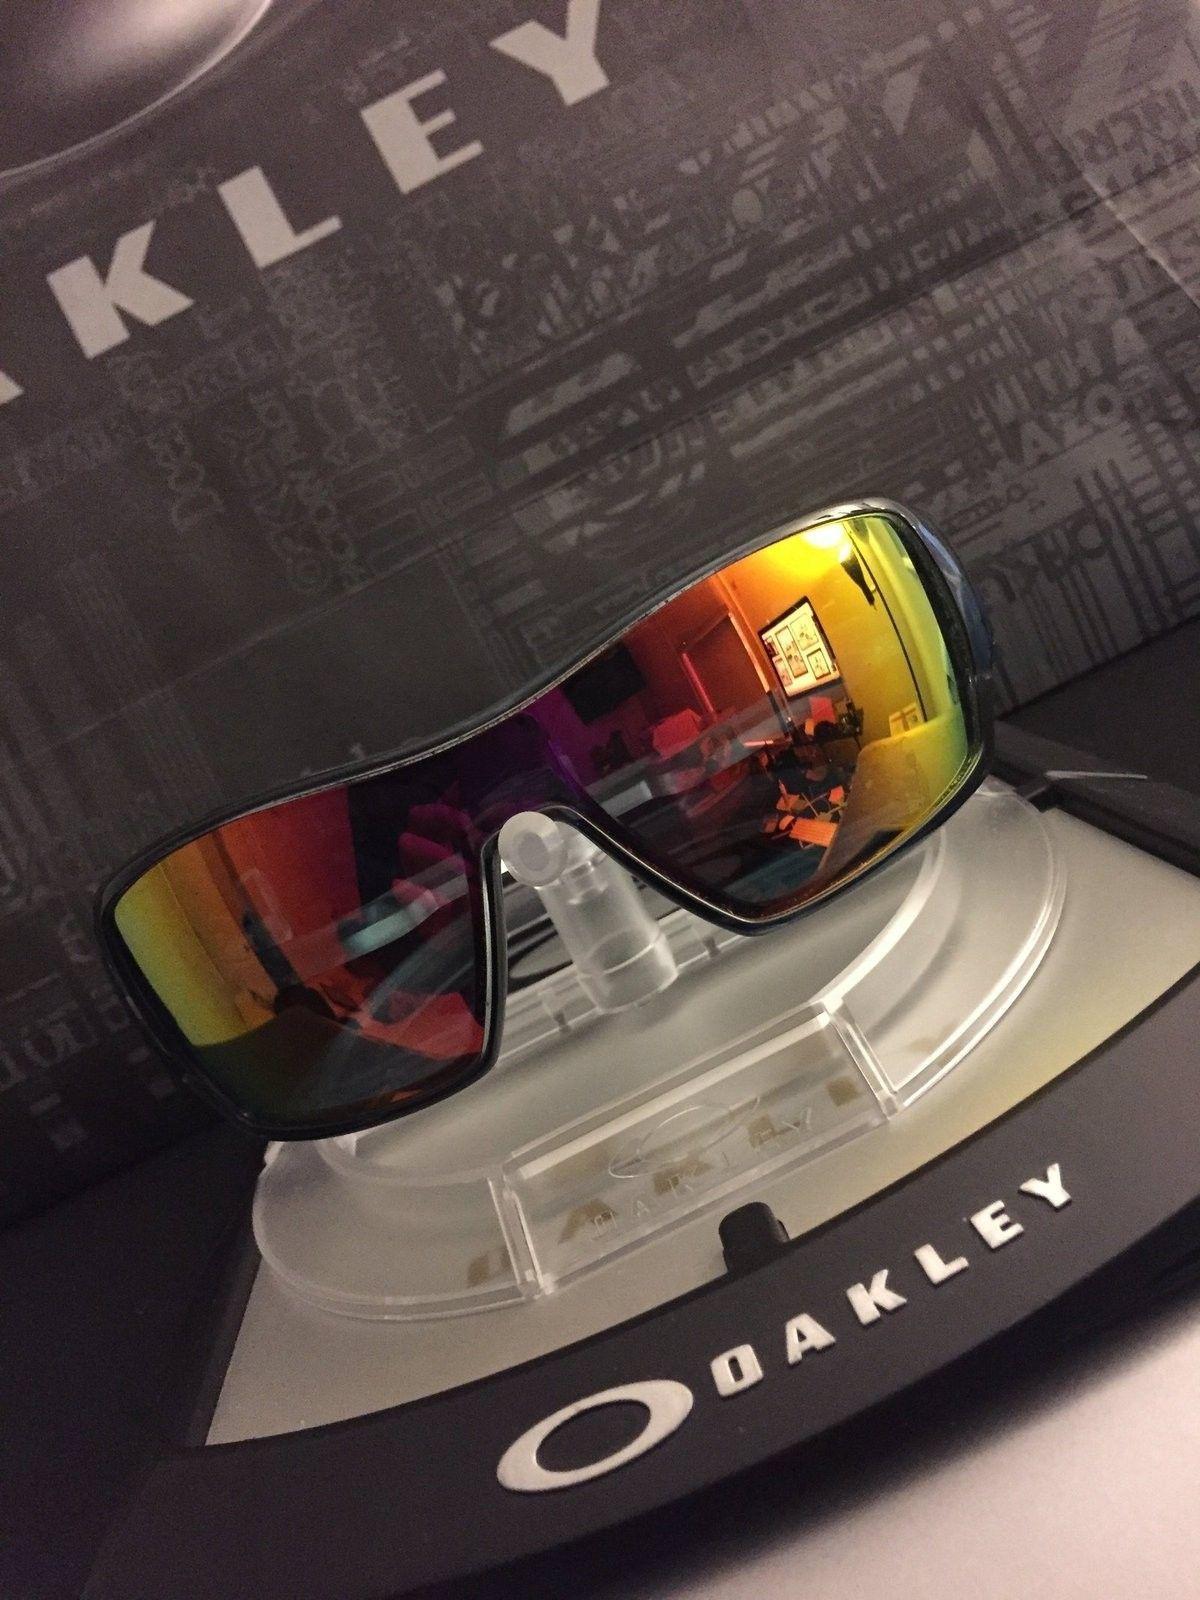 Oakley offshoot polarized ruby iridium - IMG_1637.JPG